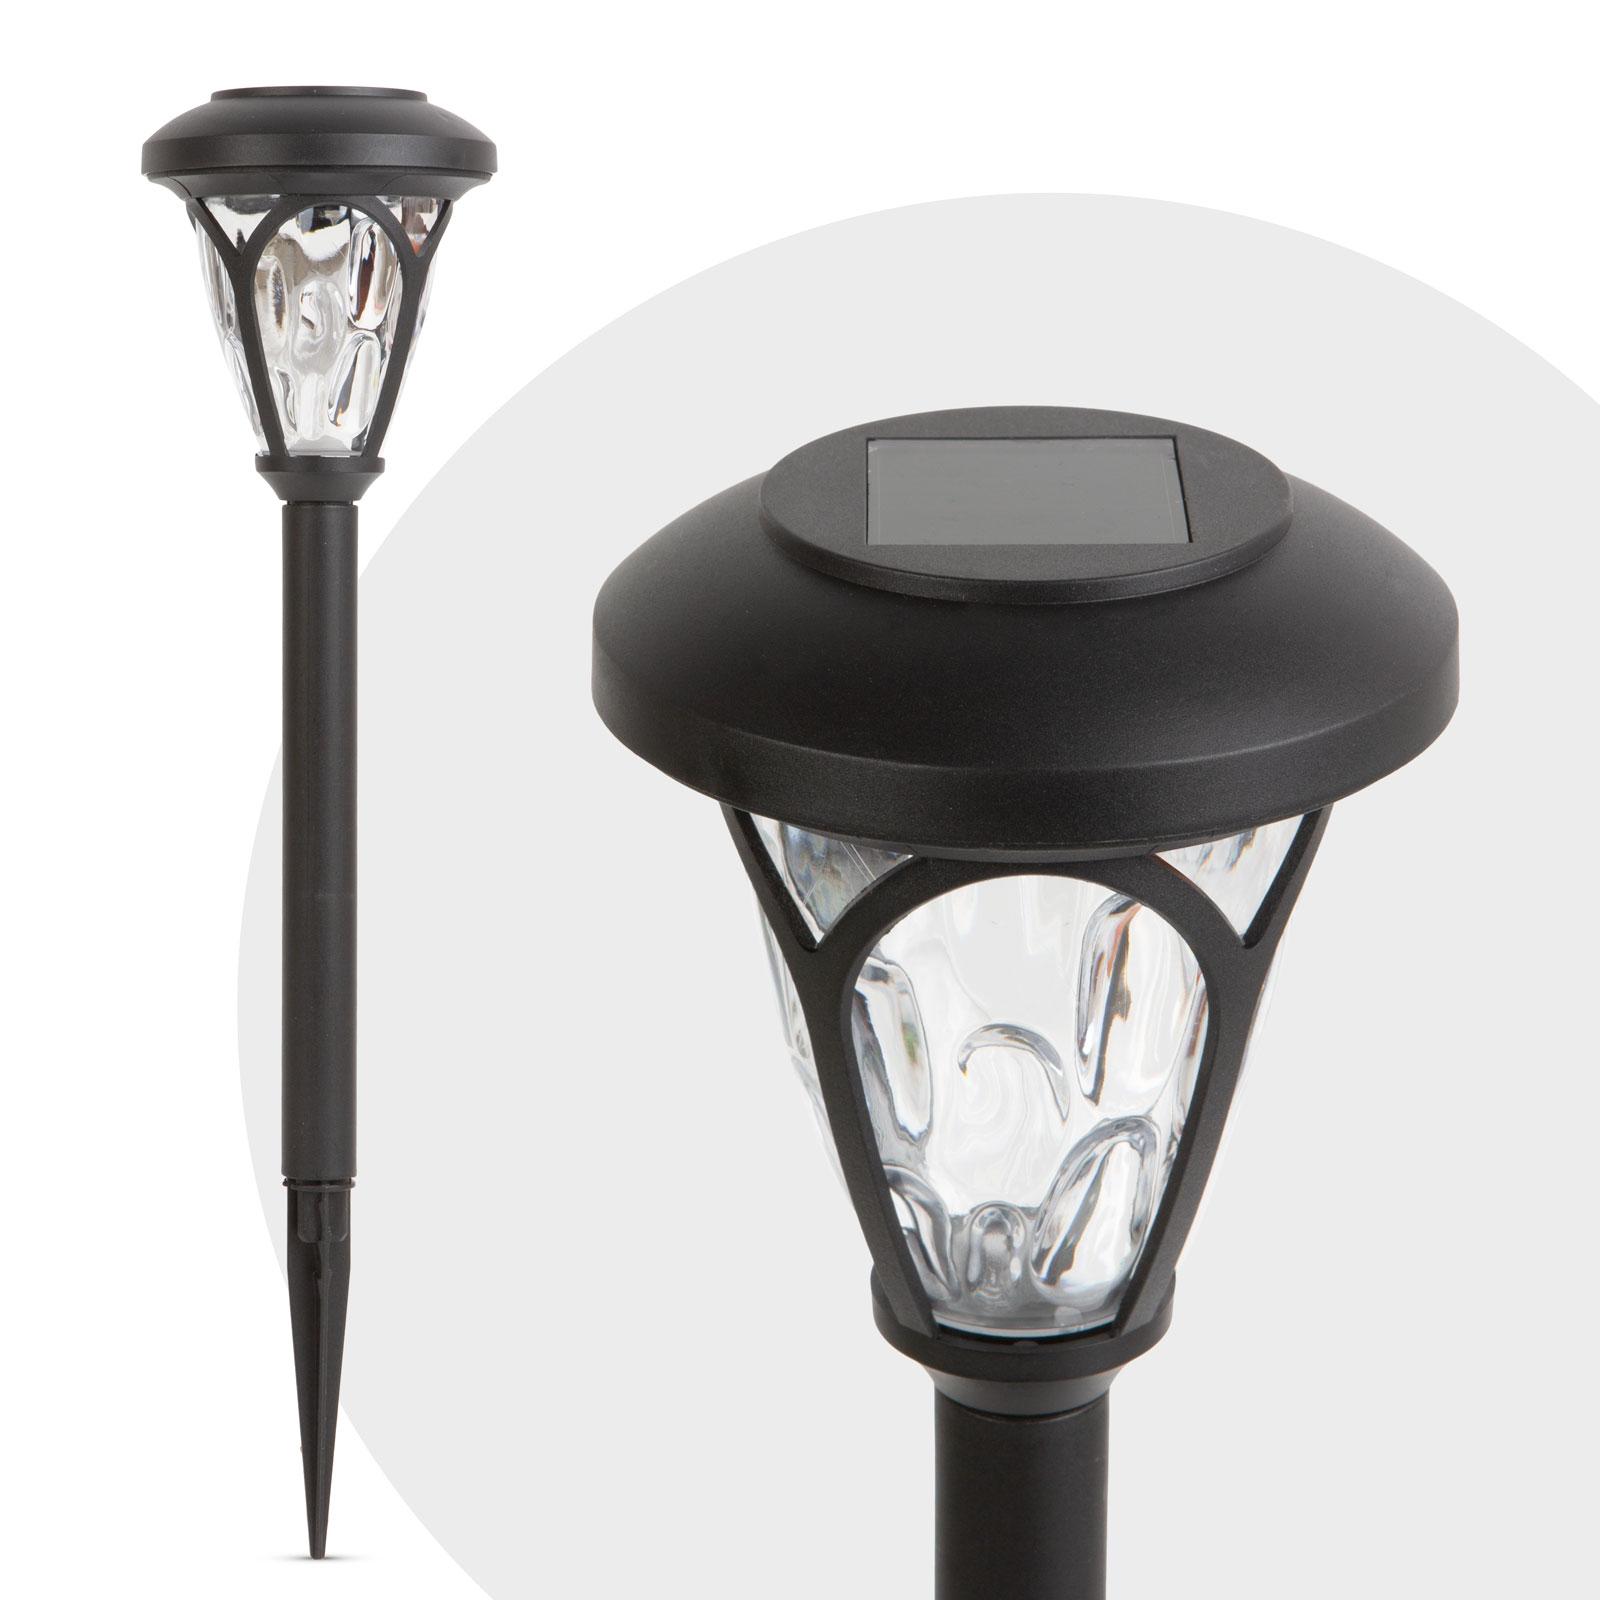 Lampa solara LED cu plexiglas modelat - negru - 400 mm